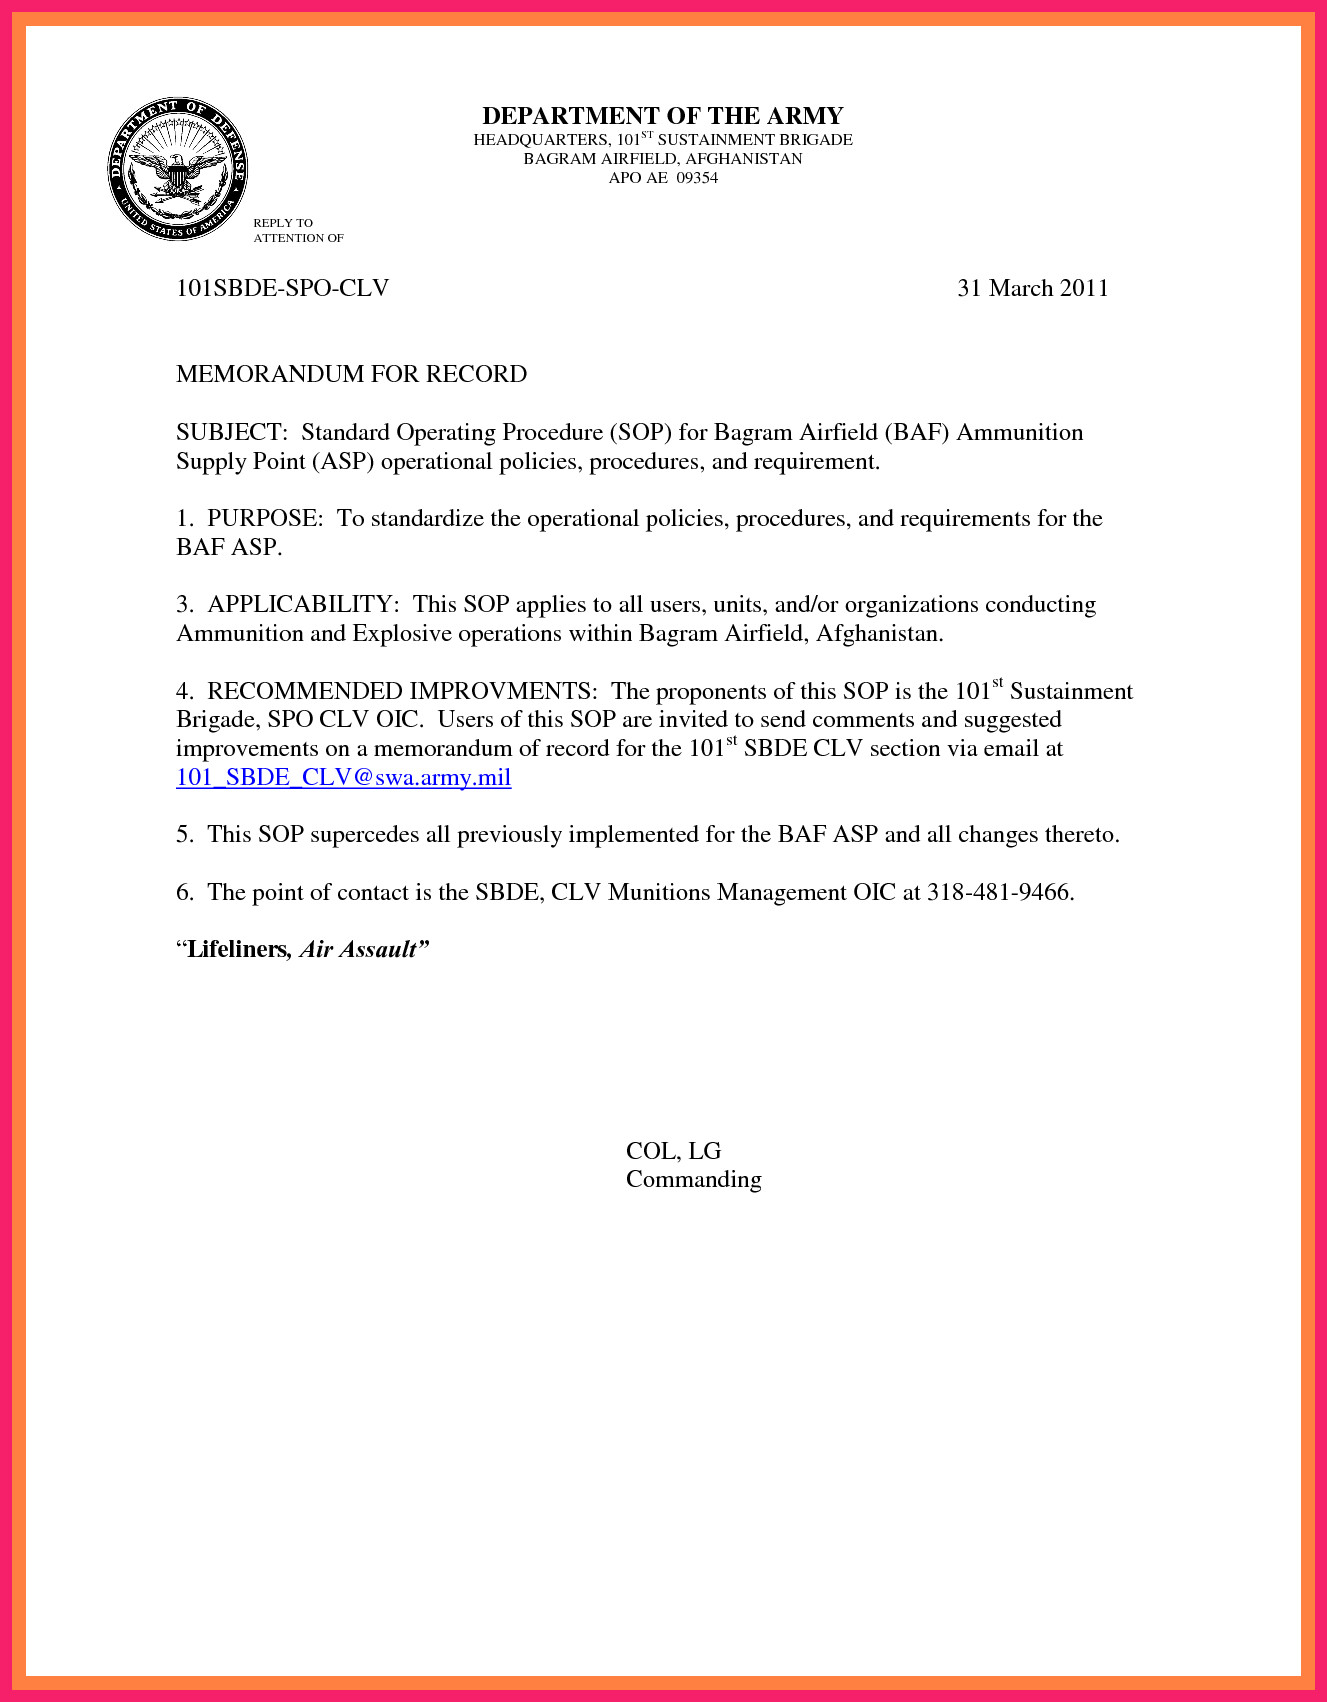 Memorandum for Record Army Memorandum for Record Army